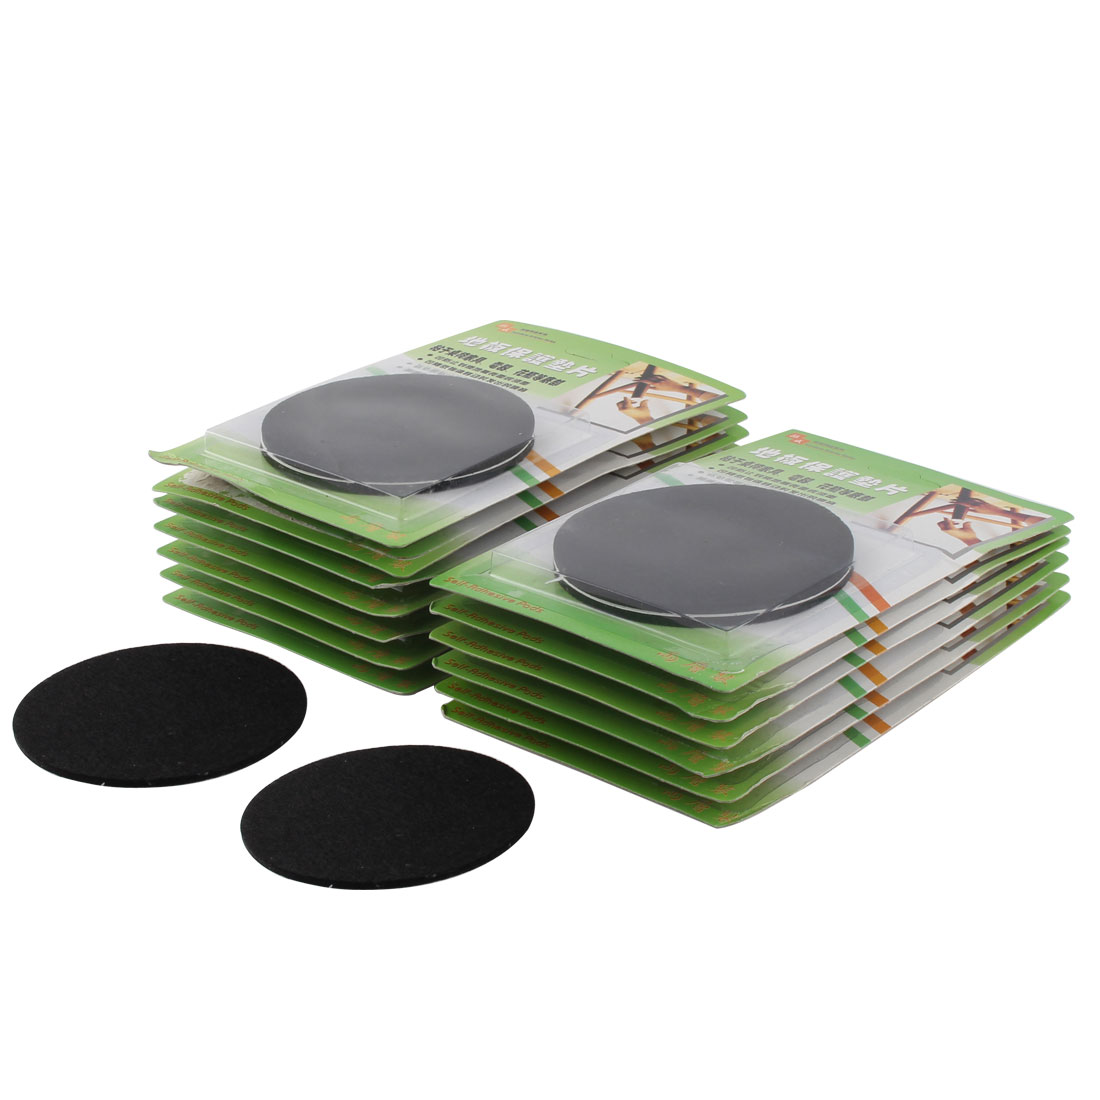 Household Self Adhesive Floor Protection Furniture Felt Pads Cushions Black 85mm Dia 28pcs